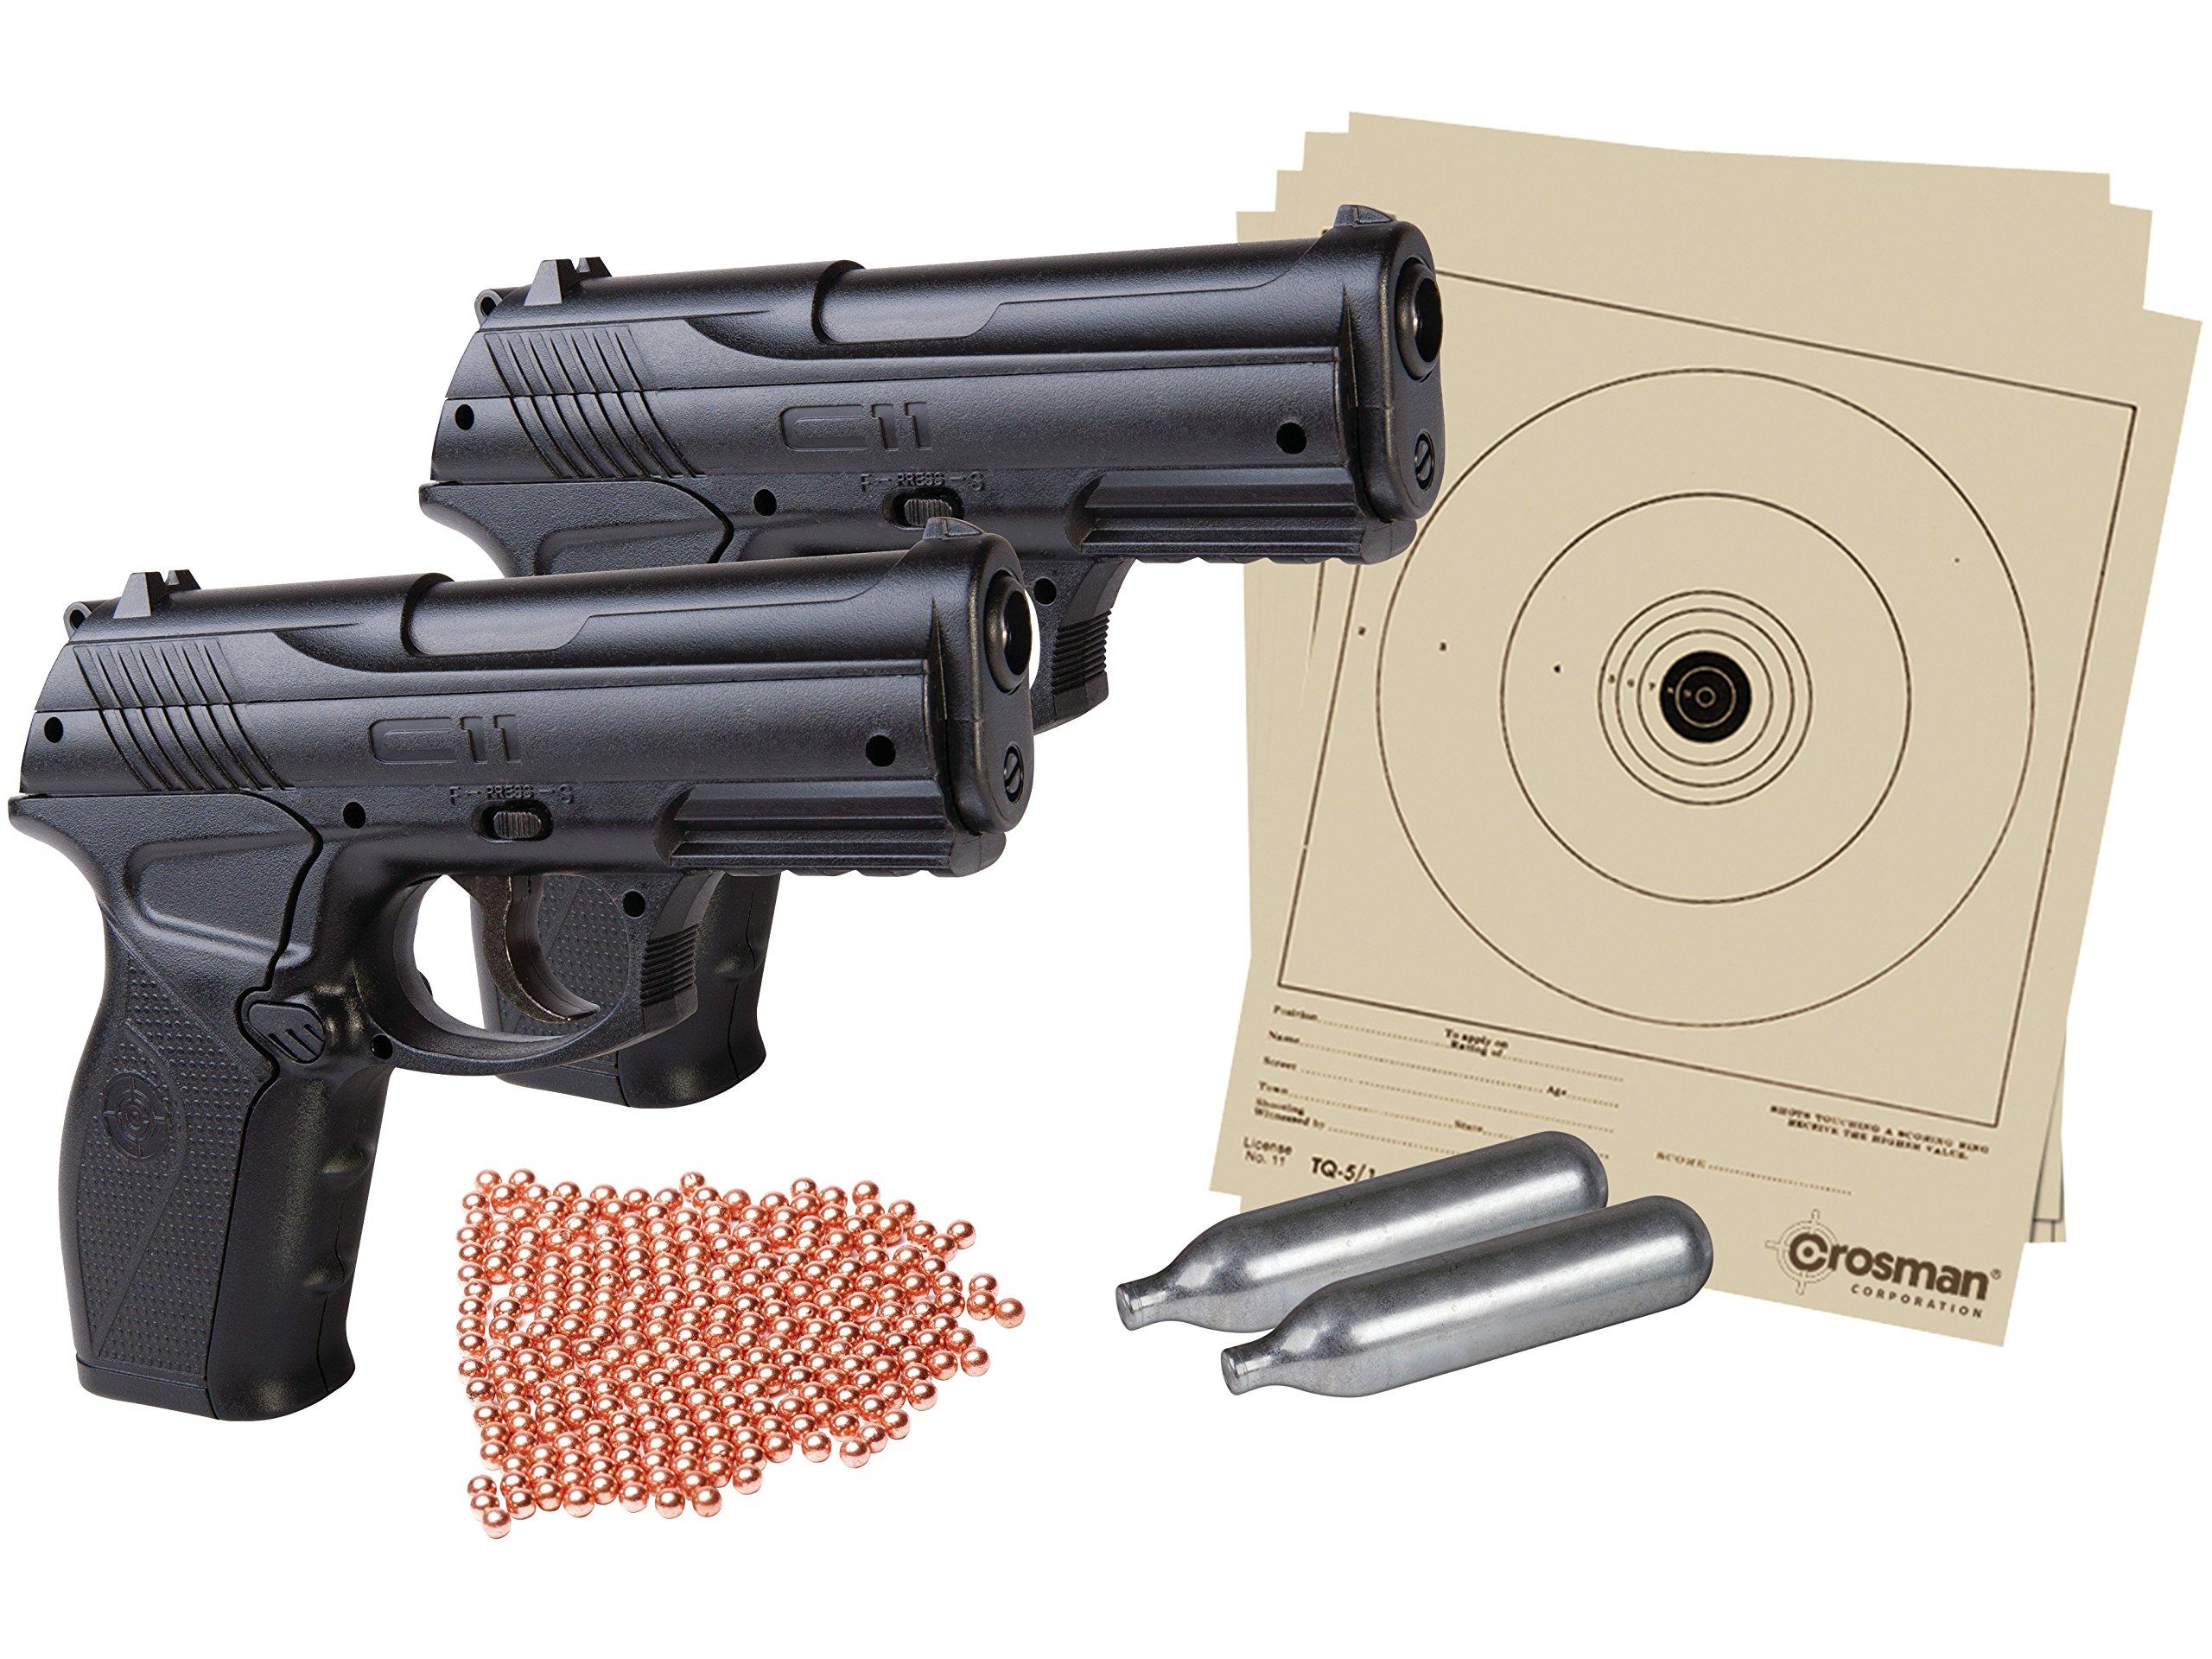 Crosman CC11KT2 Double Down Pistol Kit